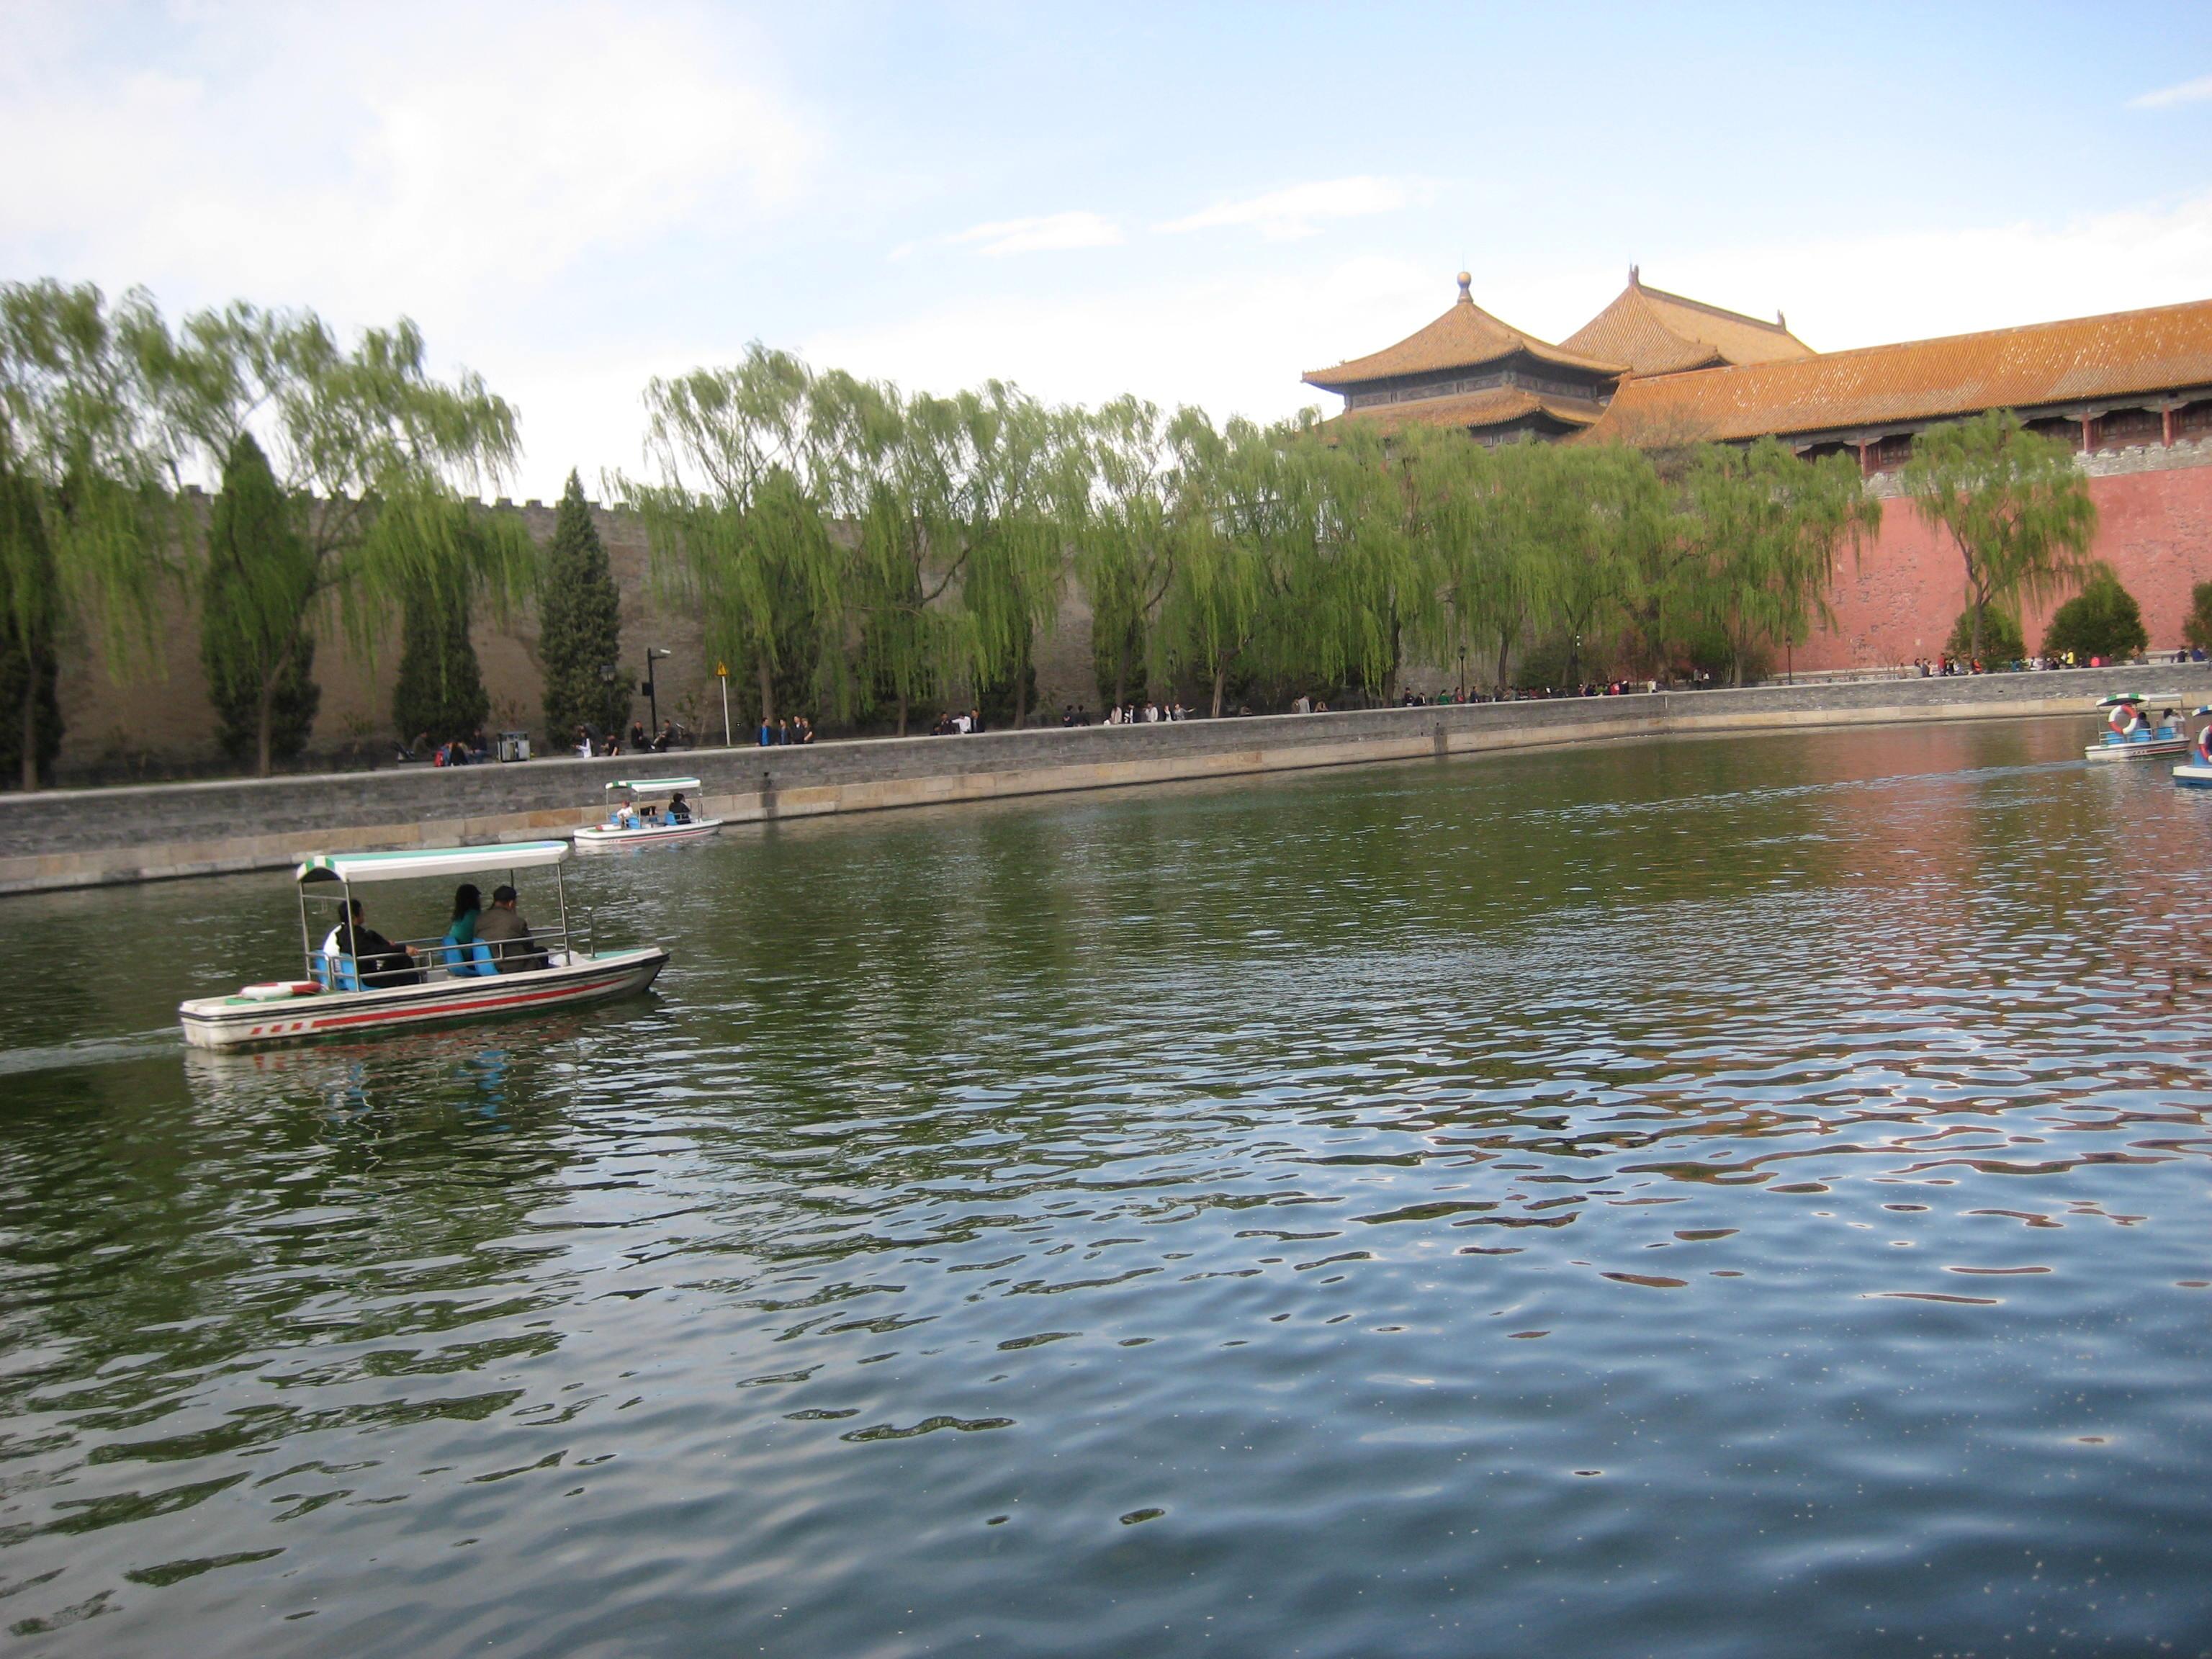 Zhongshan Park Peking matchmaking medlemmar som dejtar Charlotte